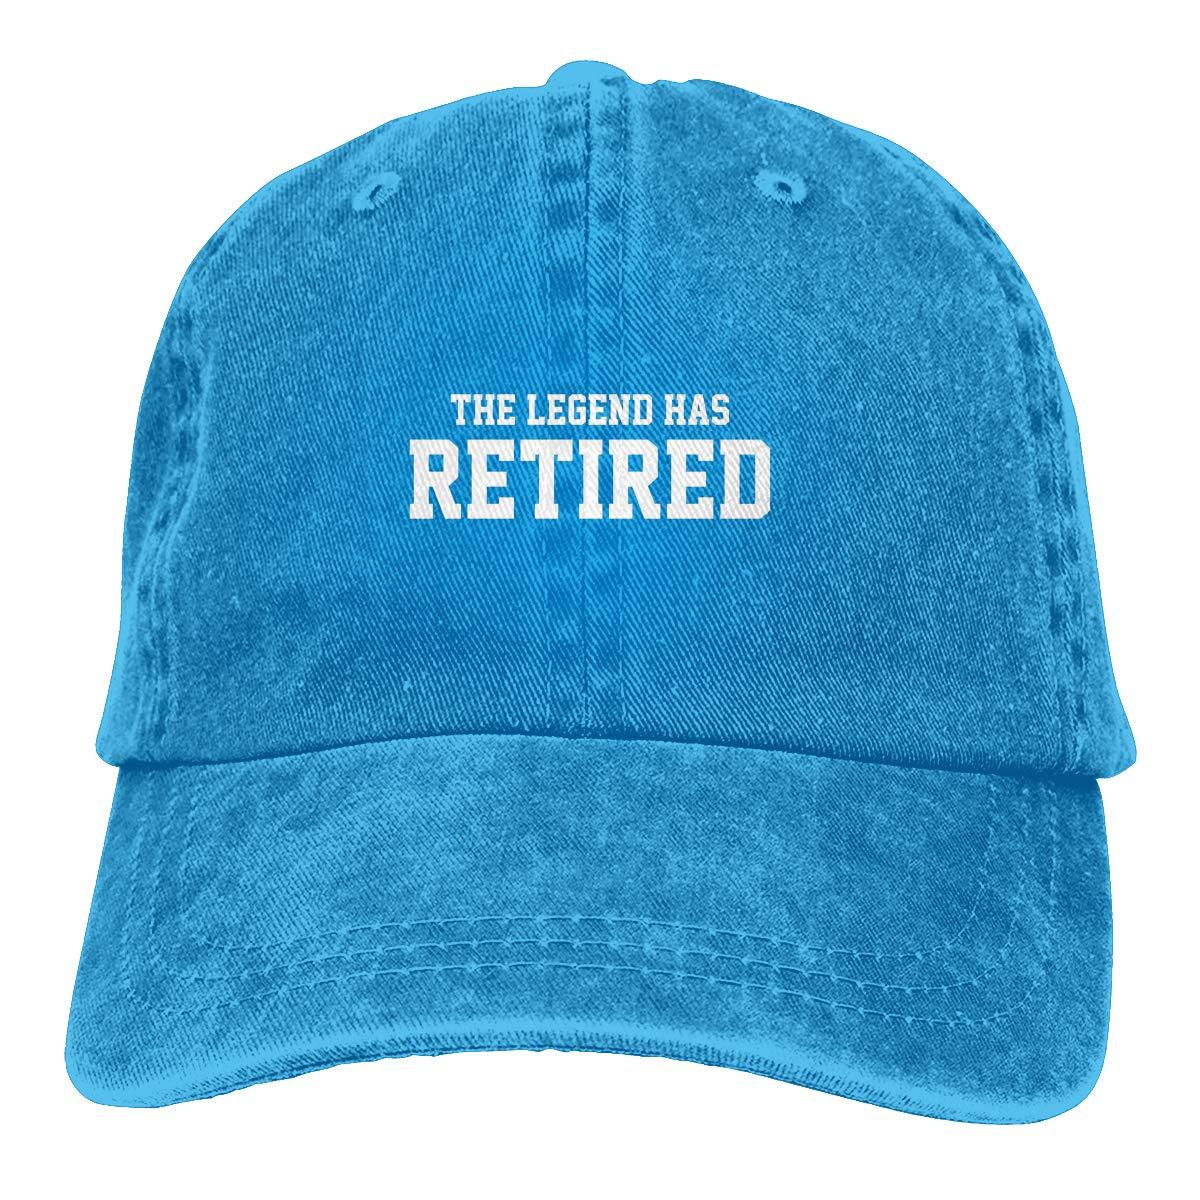 Sajfirlug The Legend Has Retired Fashion Adjustable Cowboy Cap Baseball Cap for Women and Men